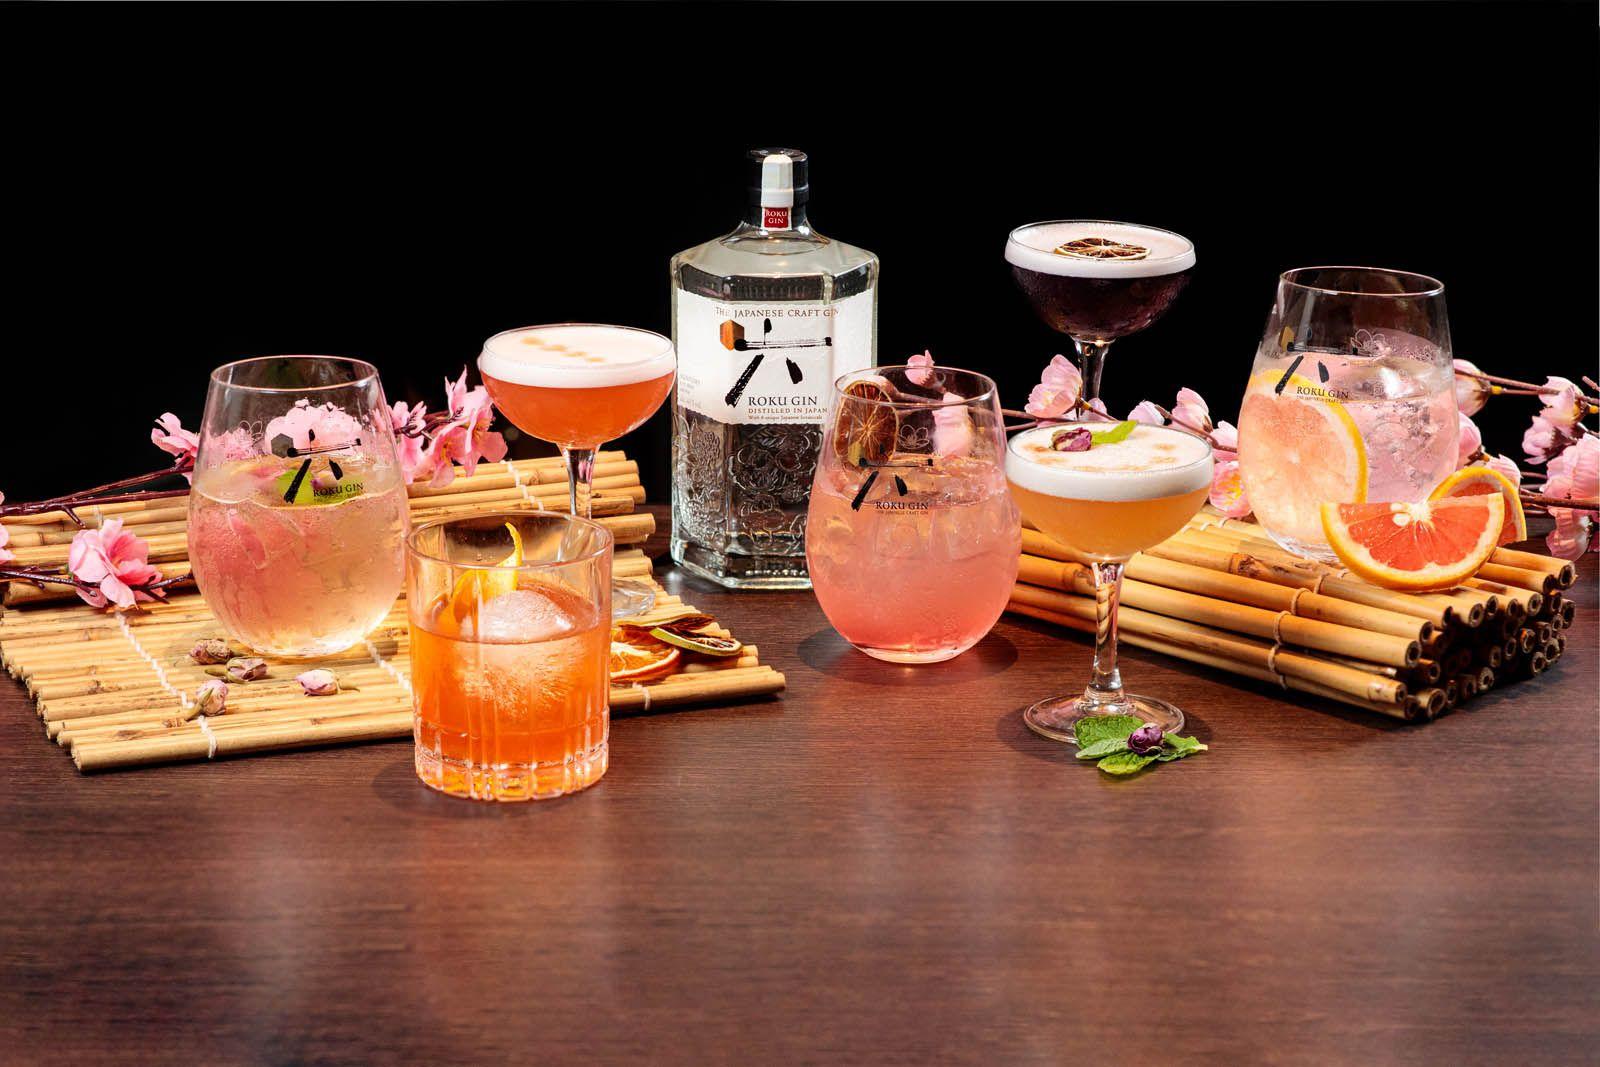 Roku Gin cocktails at Crossroads (Image: James Hii | www.jameshii.com)